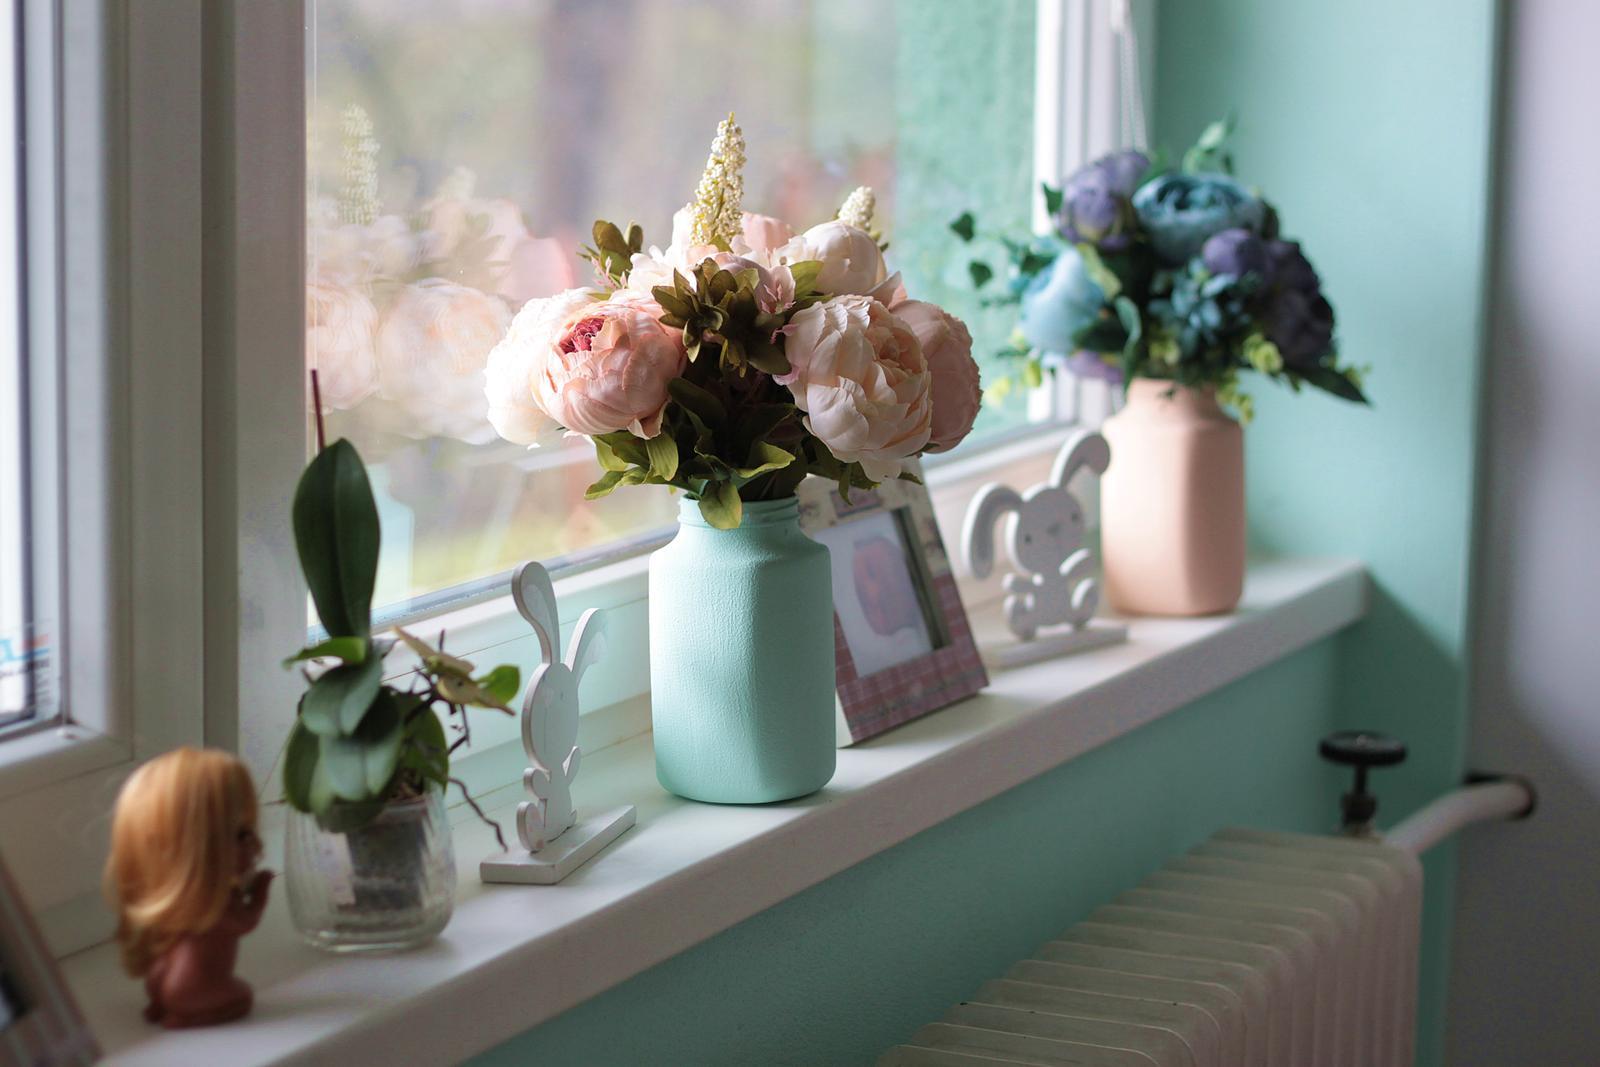 Naša rekonštrukcia - nejaké kvietky na okno s vlastnoručne vyrobenými vázičkami z nesca kávy :) :) :)